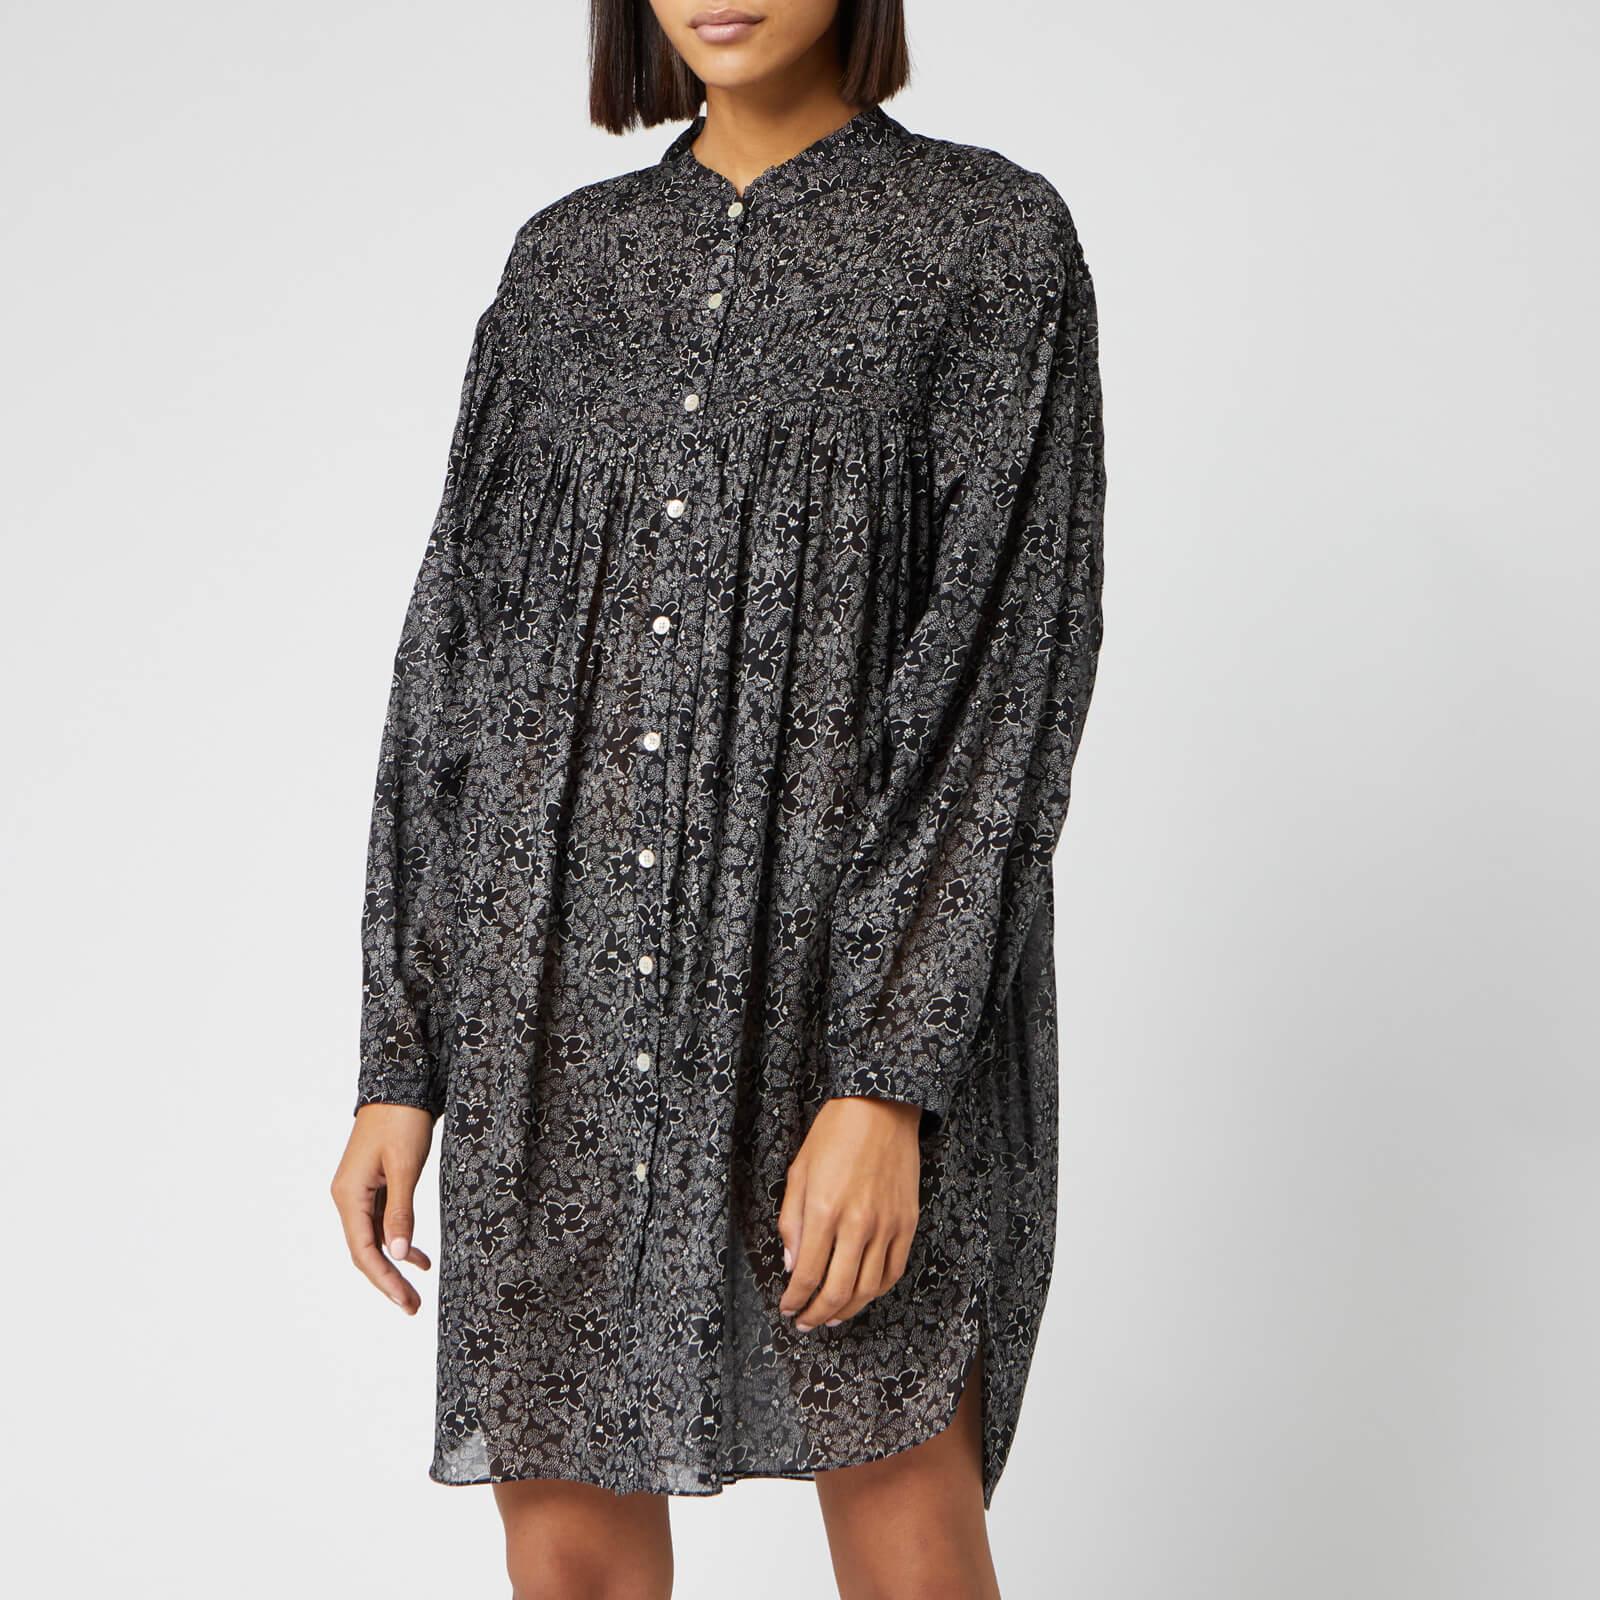 Isabel Marant Étoile Women's Lana Dress - Black - FR 34/UK 6 - Black